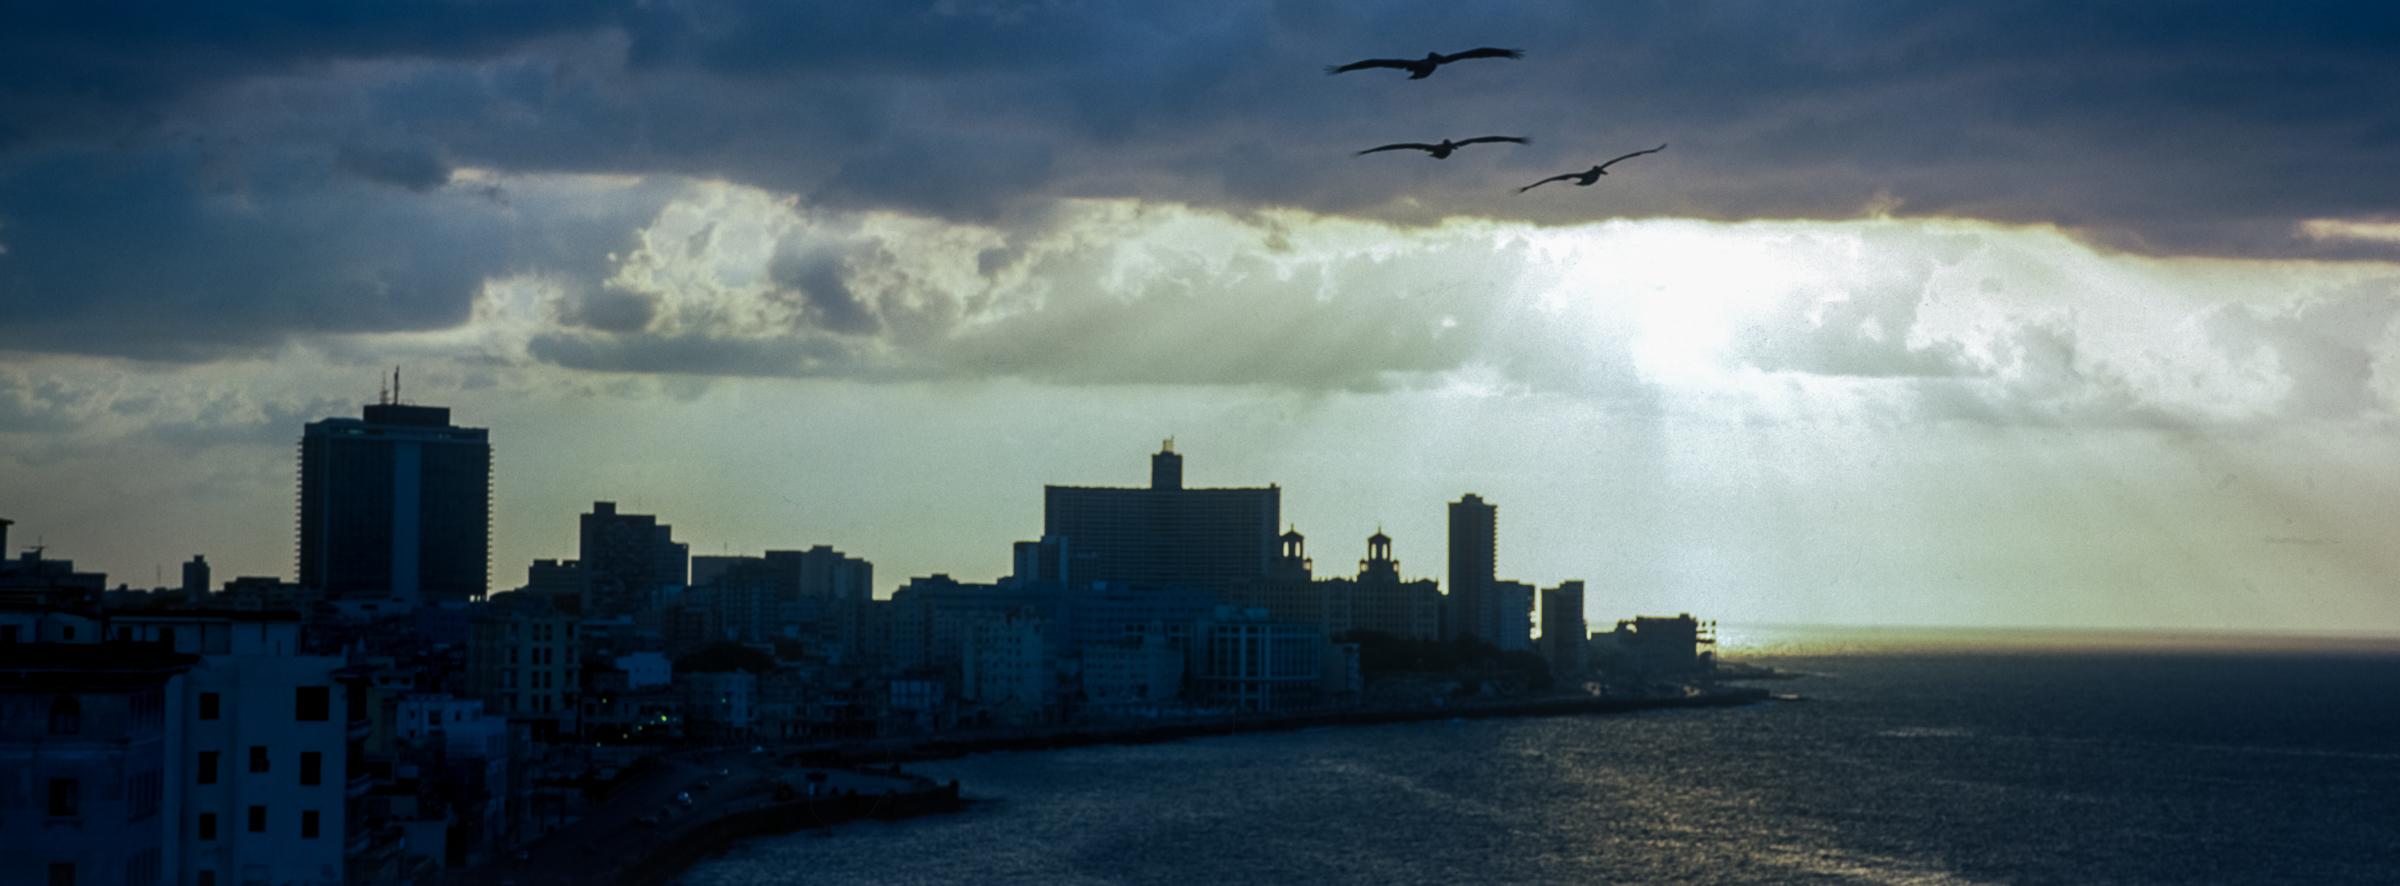 Пеликаны над Гаваной